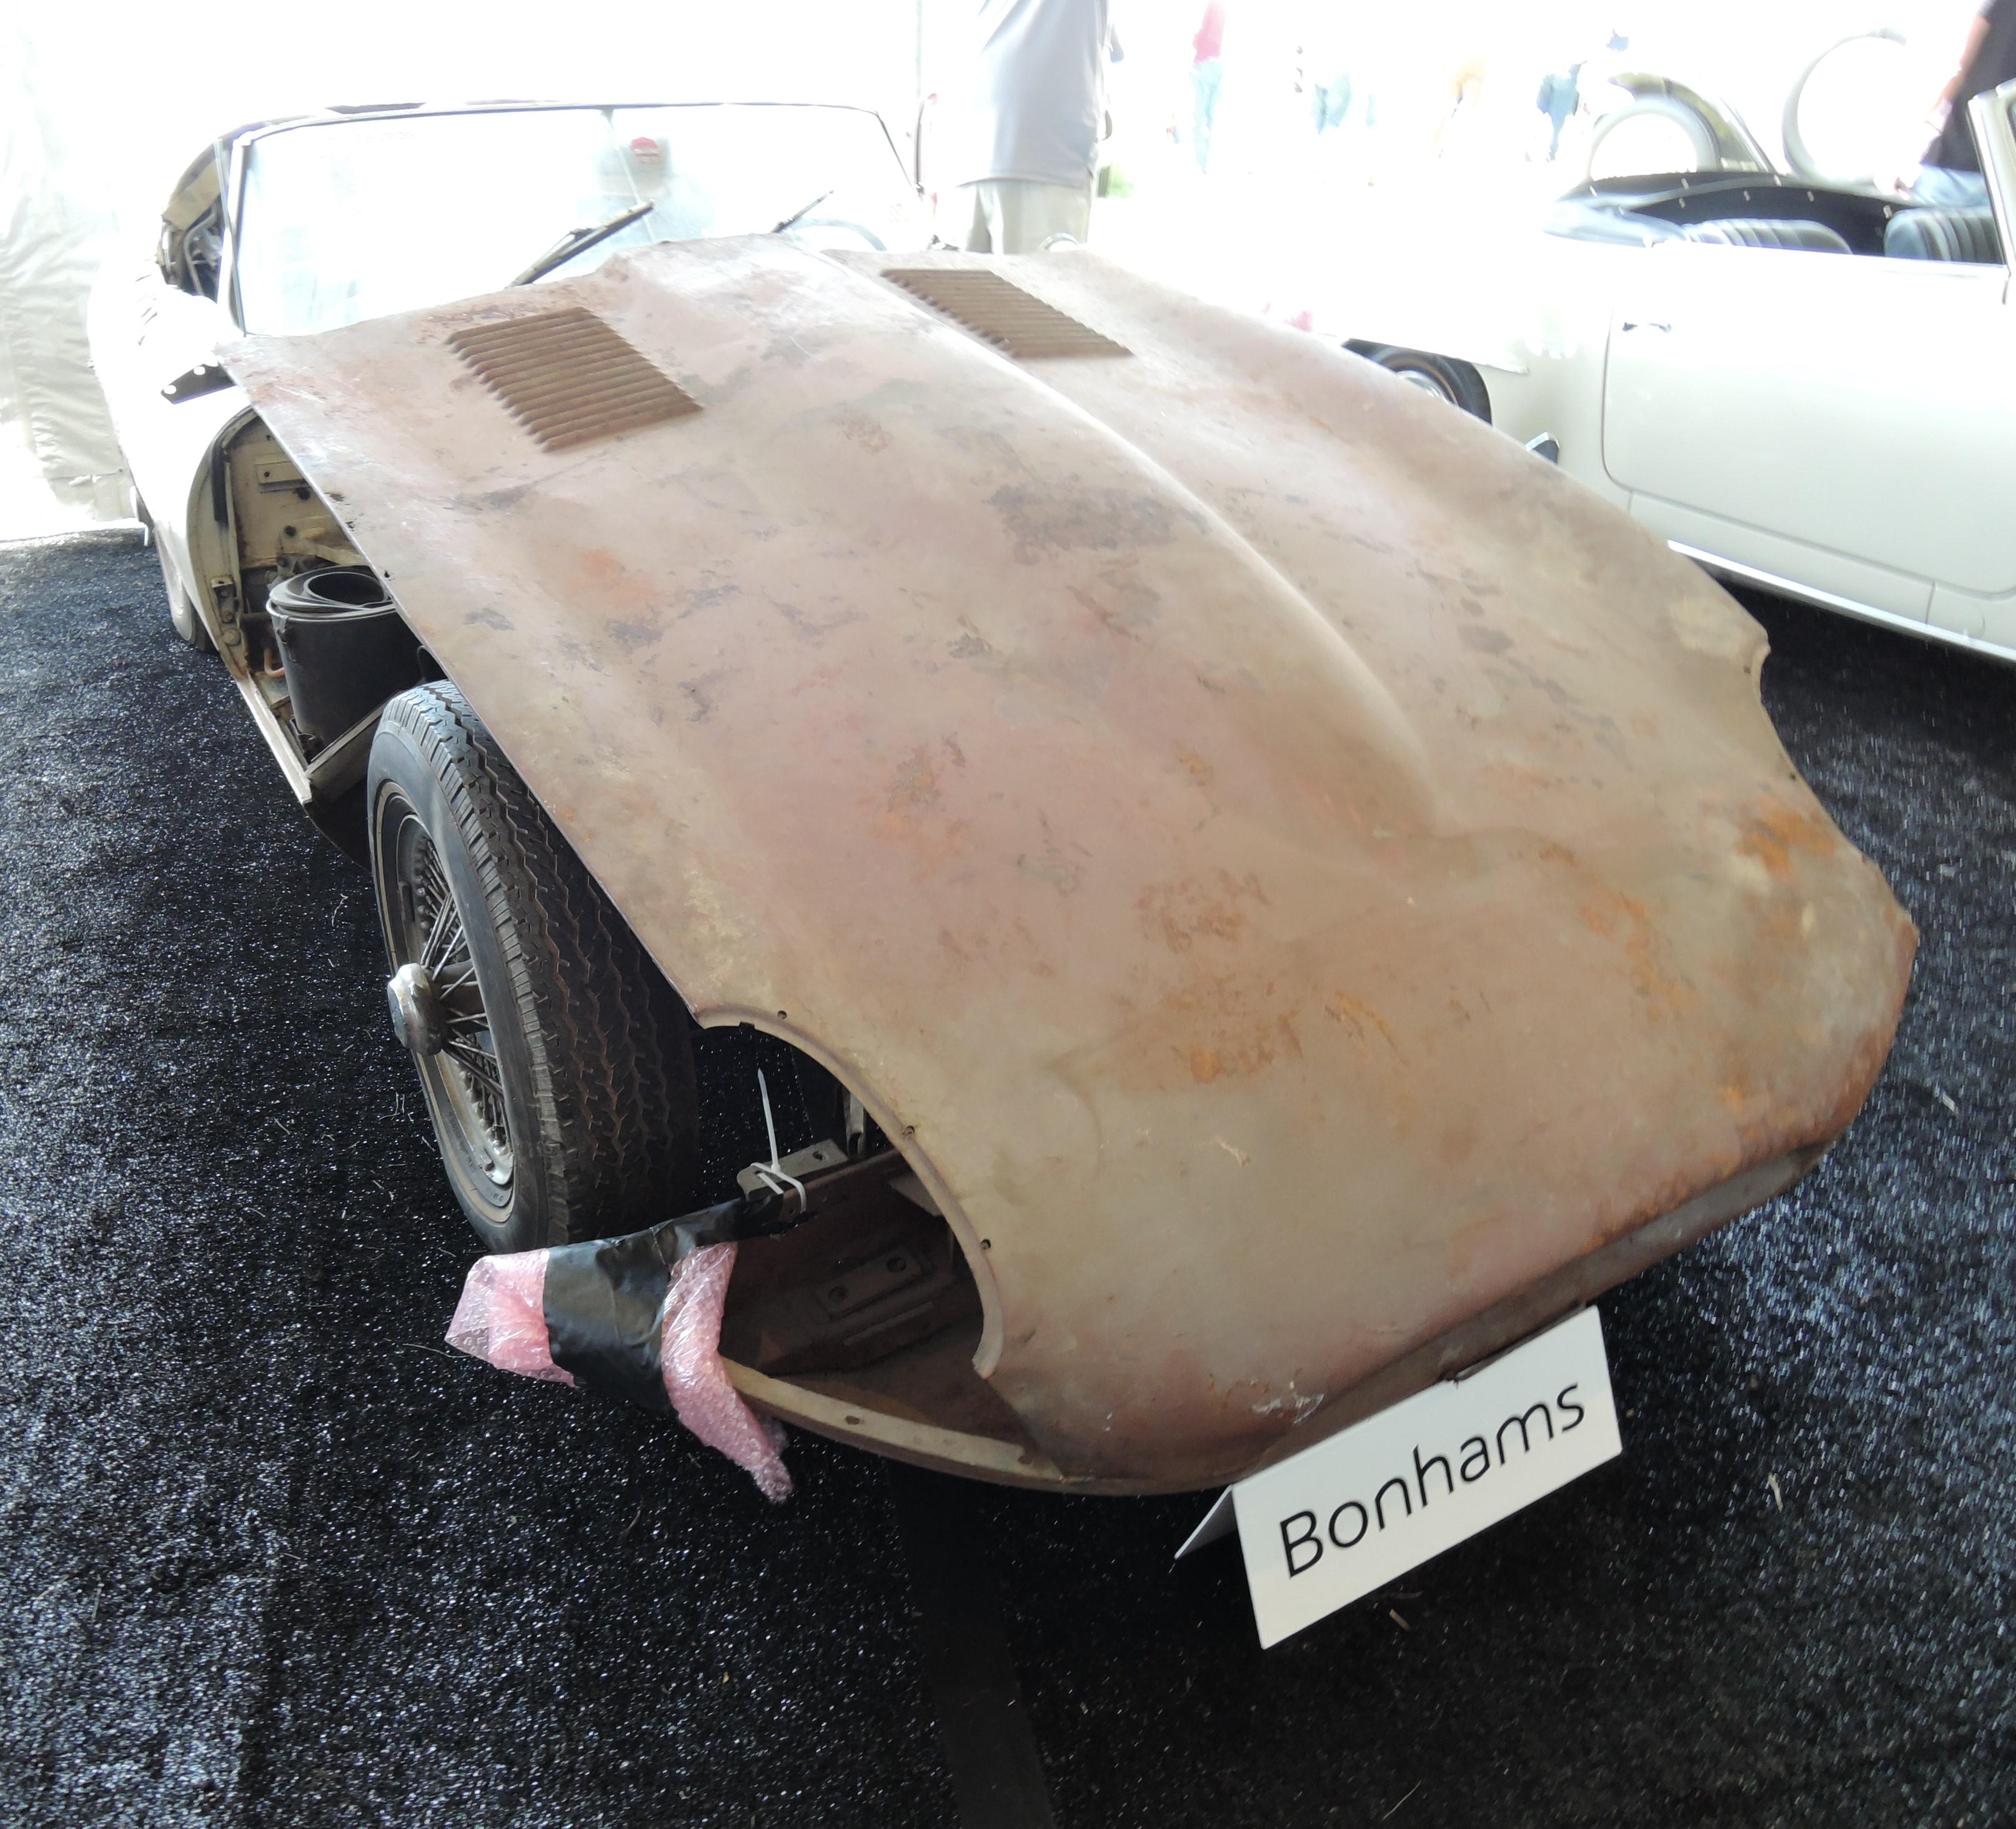 bonhams white project 1966 Jaguar E-Type Series I 4.2 Roadster - Greenwich Concours d'Elegance 2017